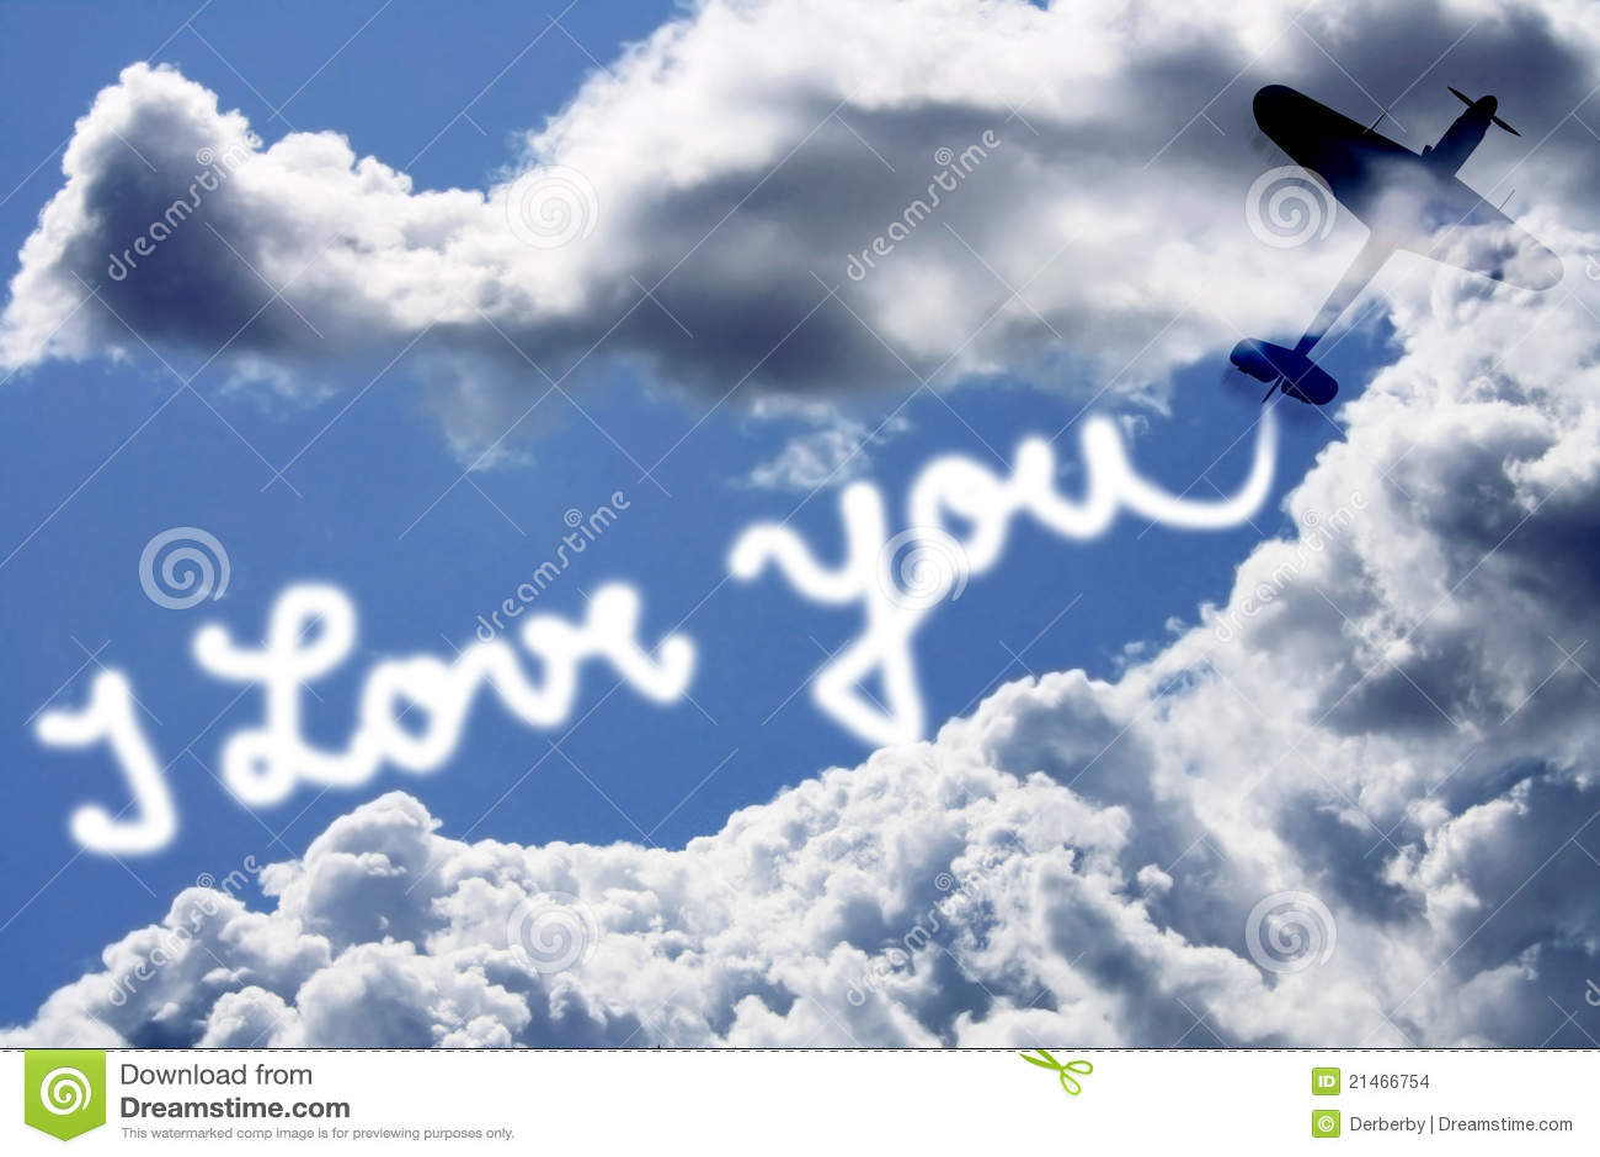 I Love You Imágenes De Stock I Love You Fotos De Stock: I Love You Stock Images